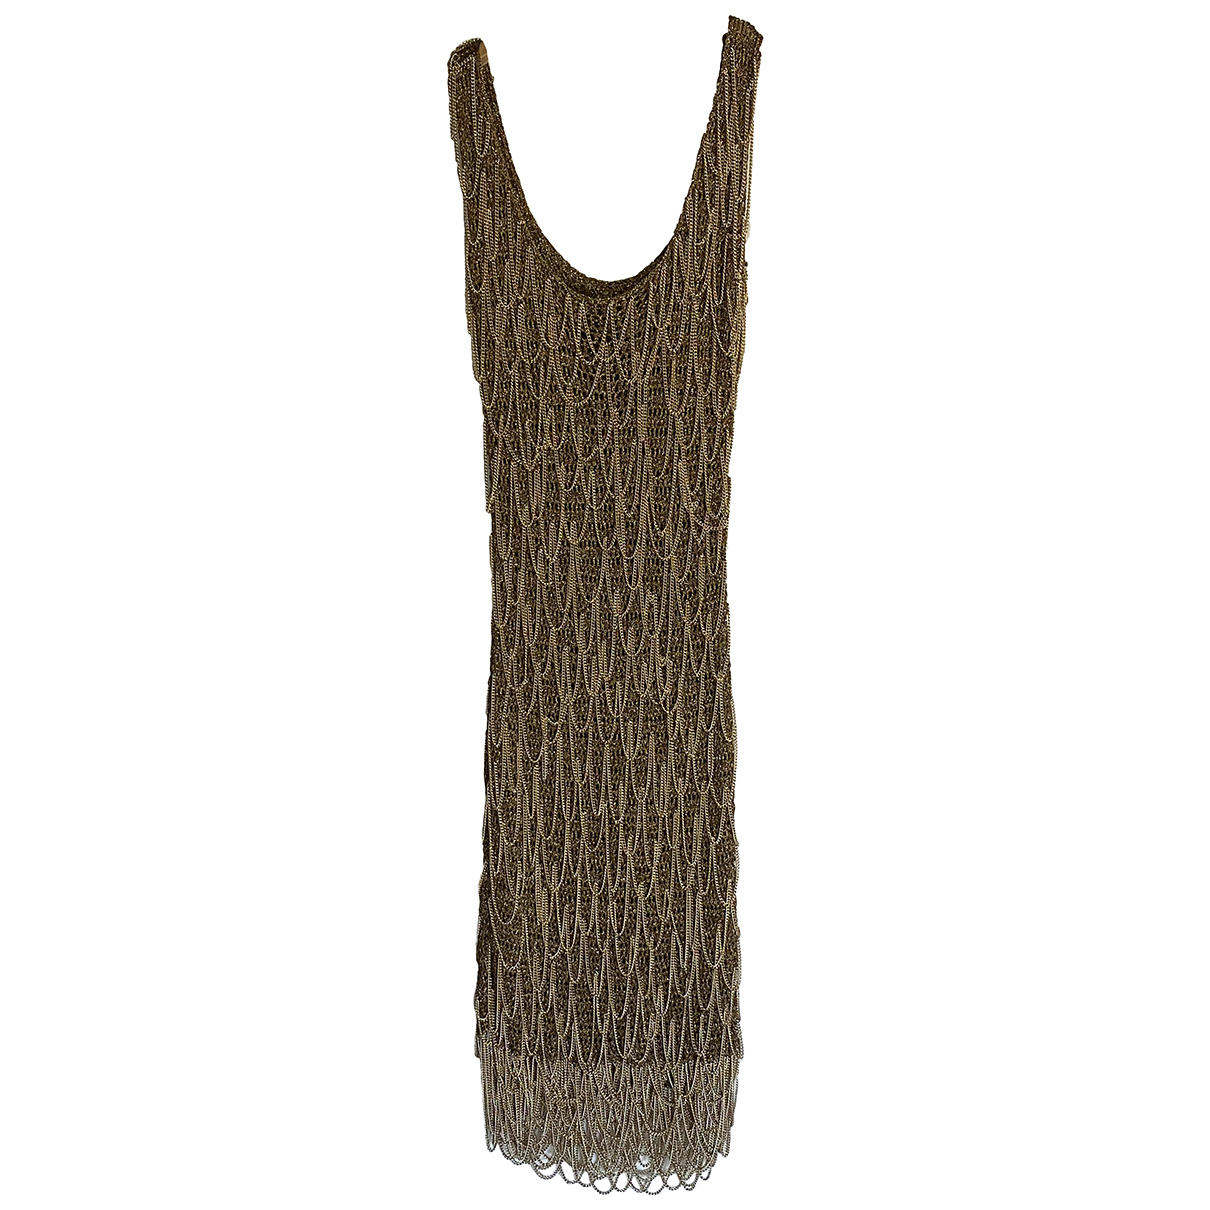 Salvatore Ferragamo N Gold Glitter Dress for Women